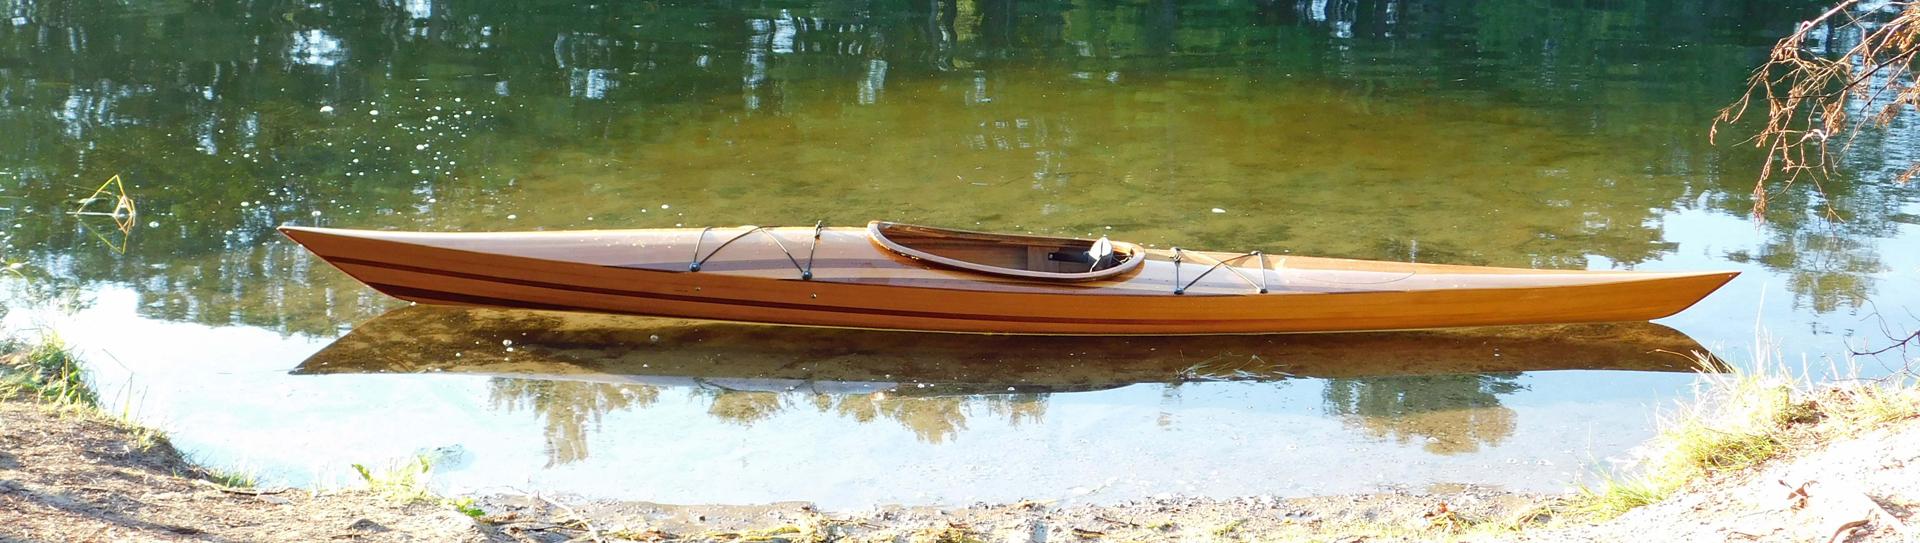 Otto Vallinga Yacht Design - Image 34